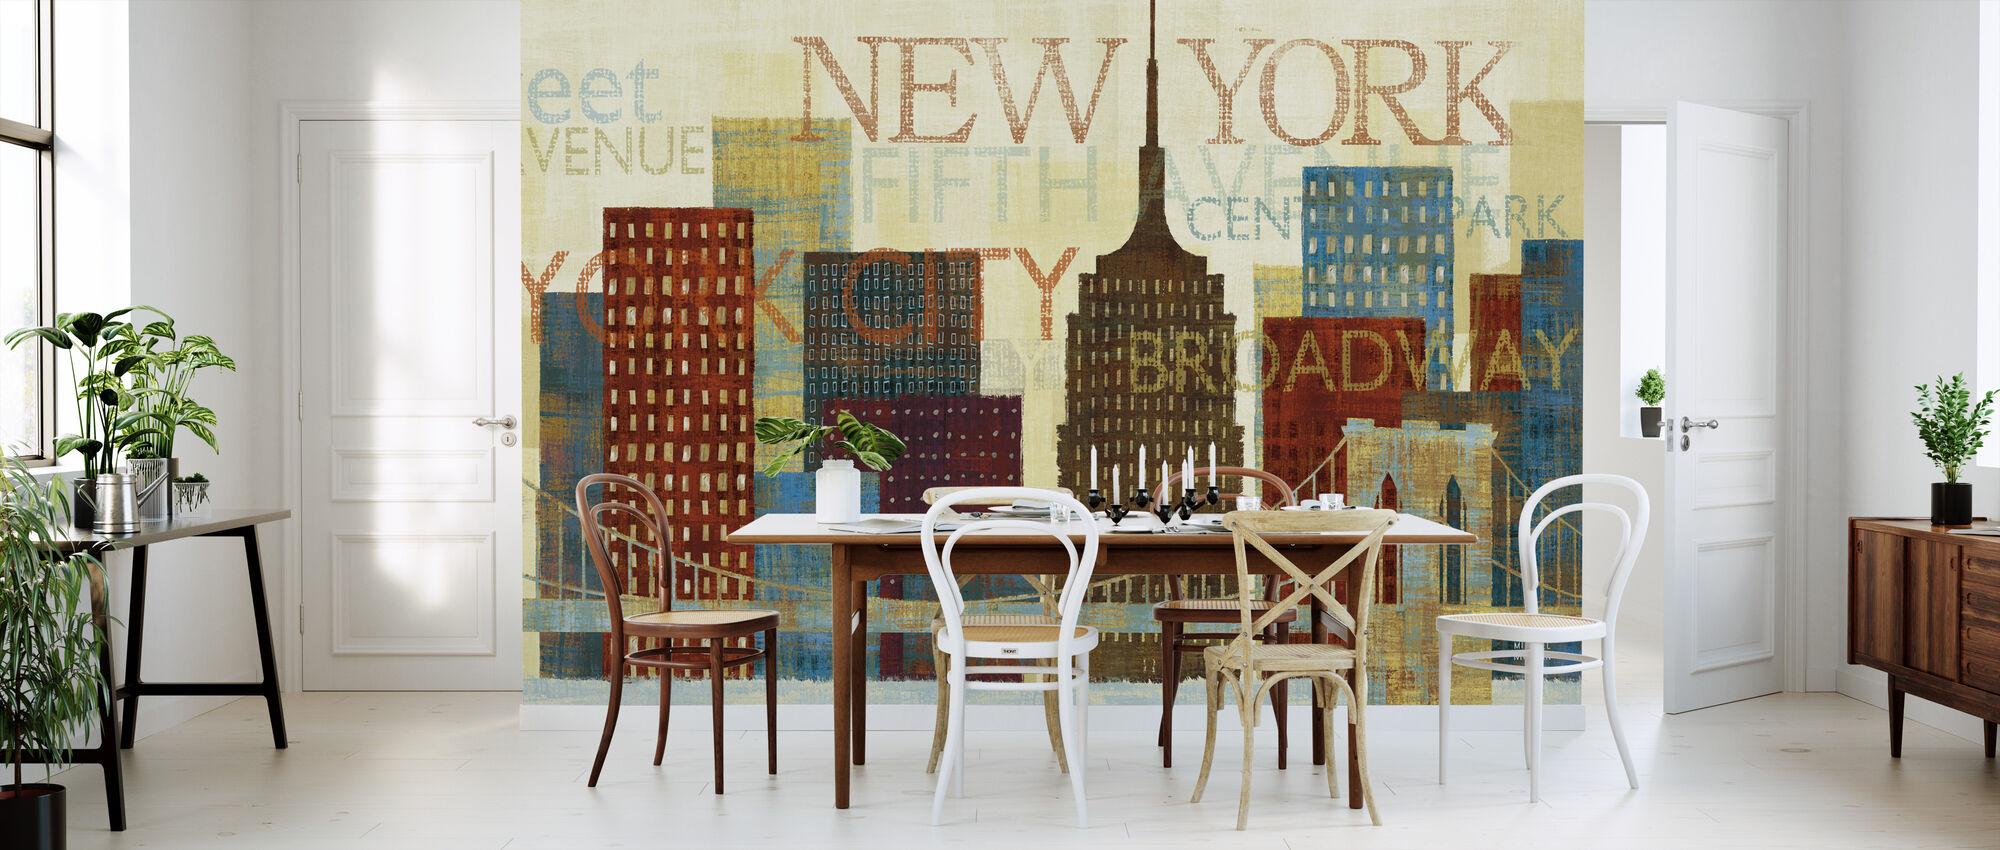 hey new york fototapete nach ma photowall. Black Bedroom Furniture Sets. Home Design Ideas